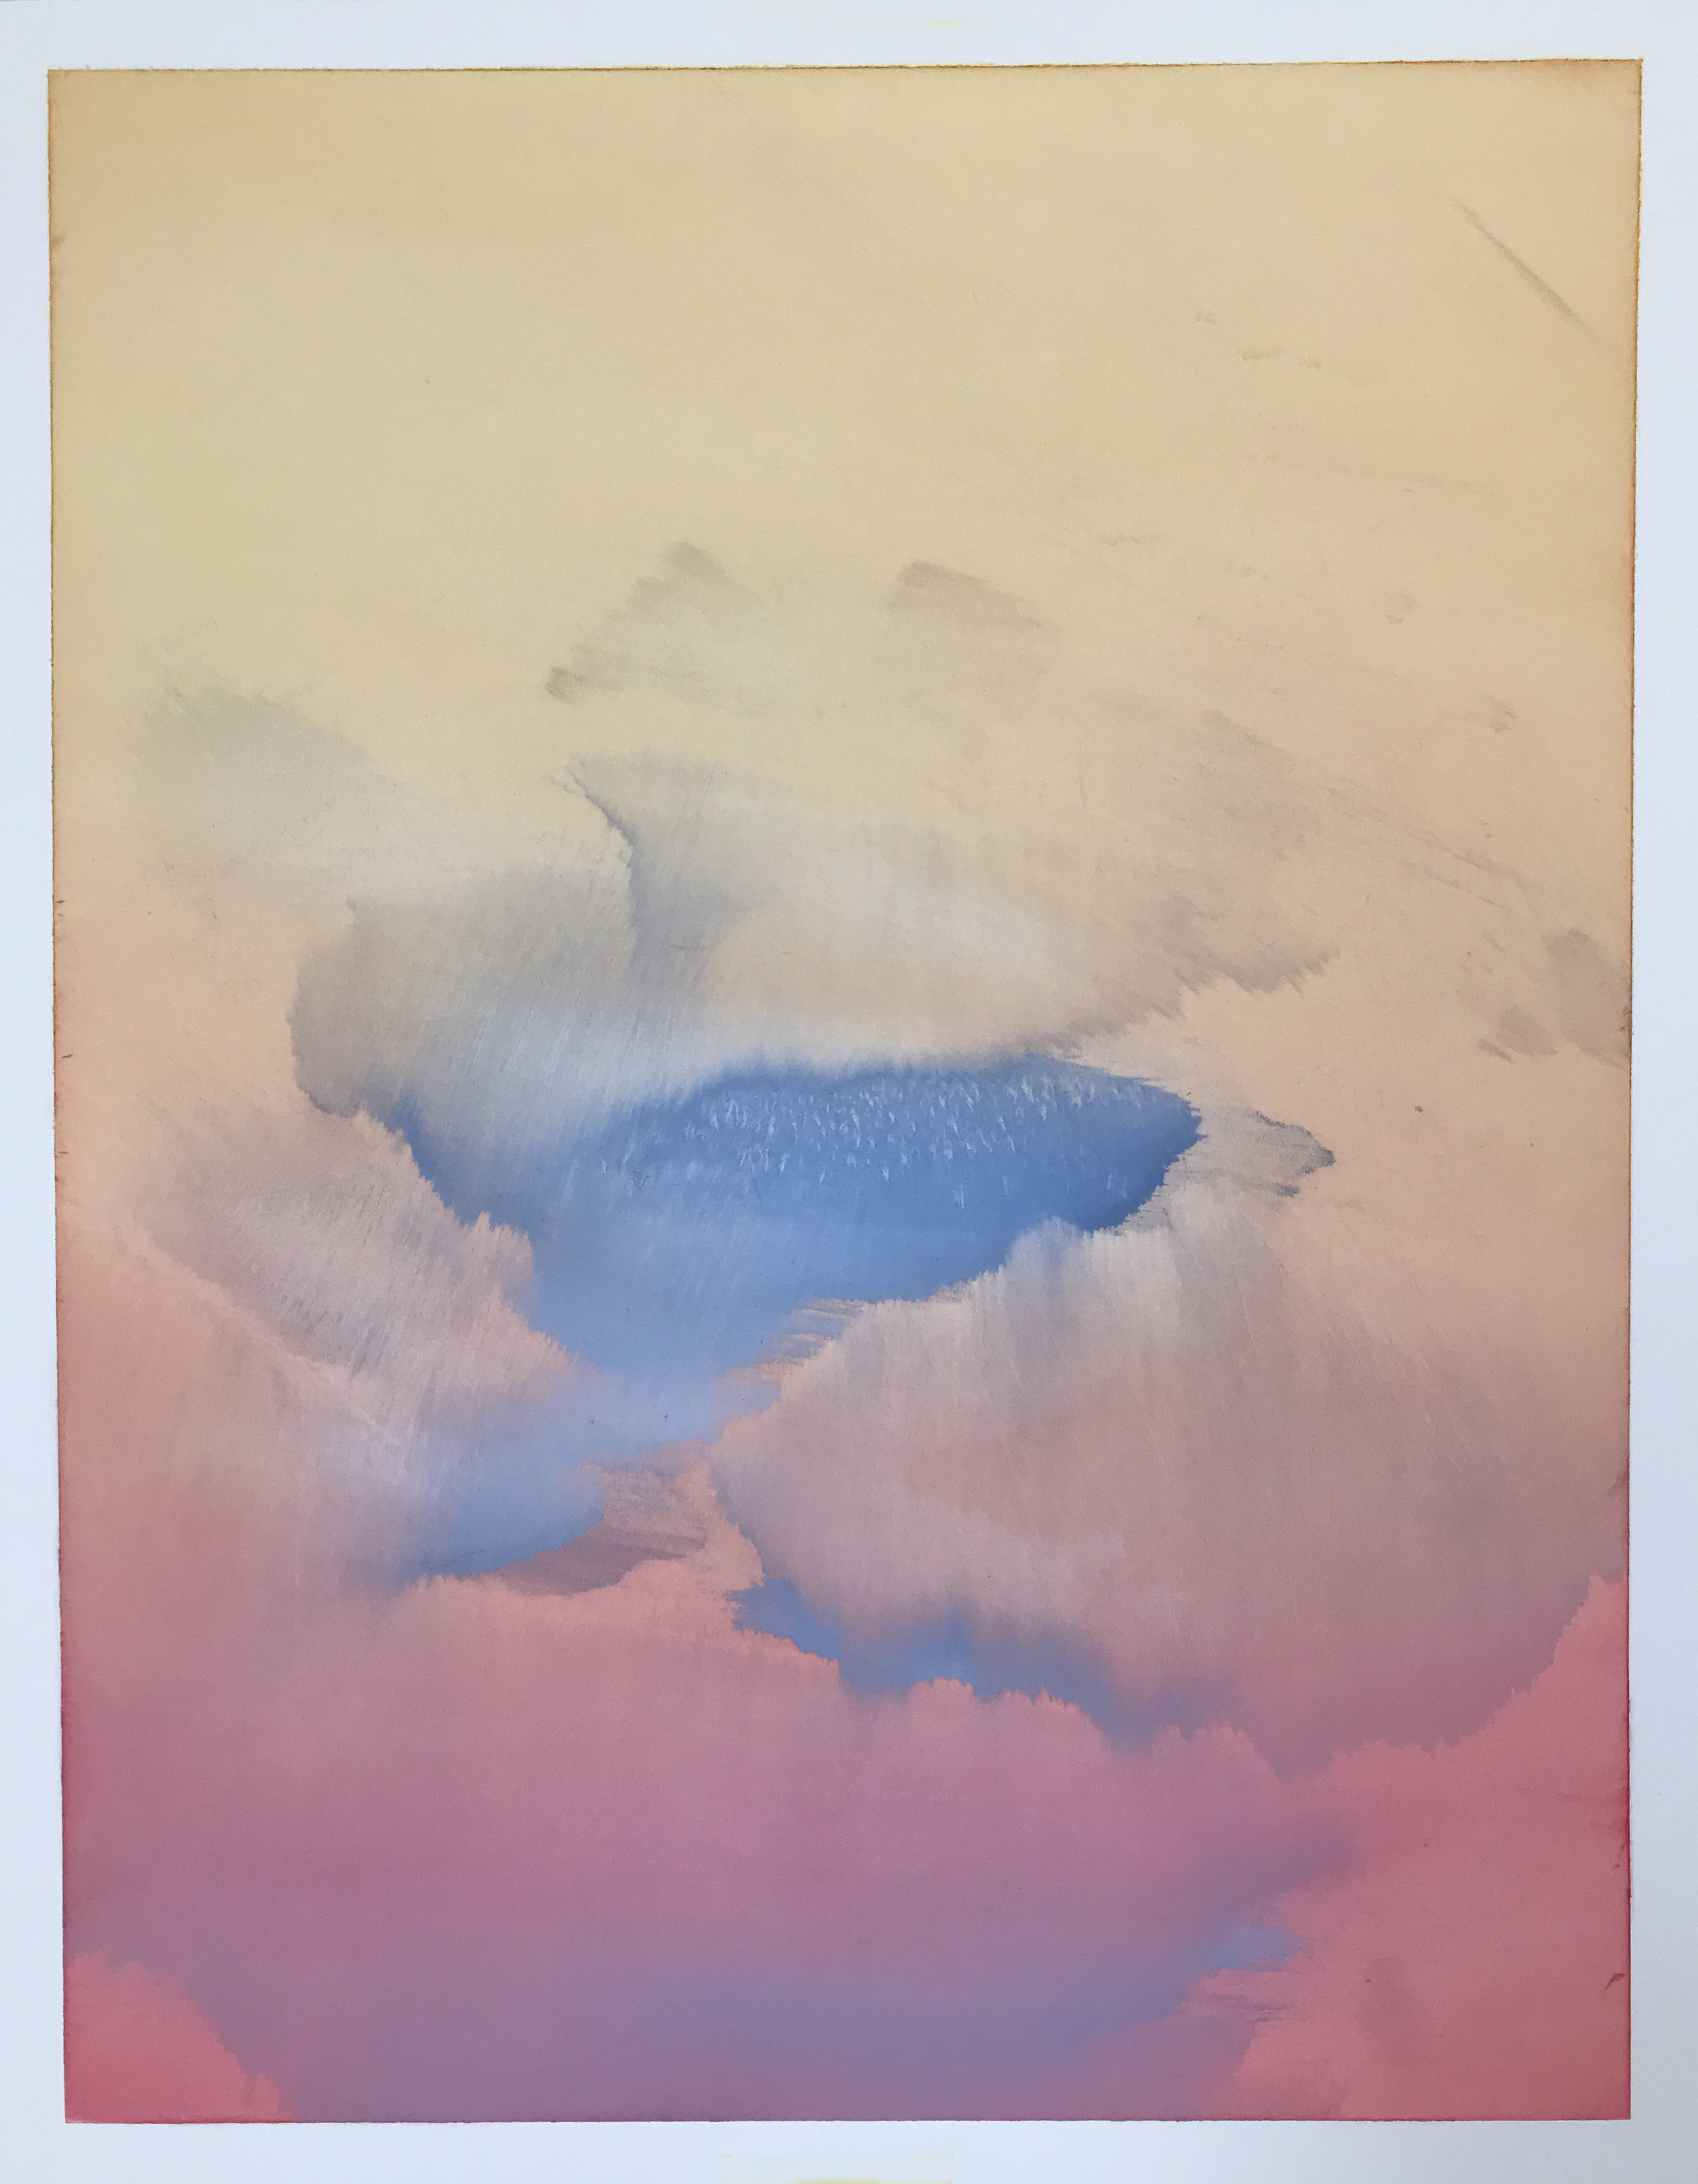 "O.T. (no. 163), 14"" x 11"", oil on paper, 2019"